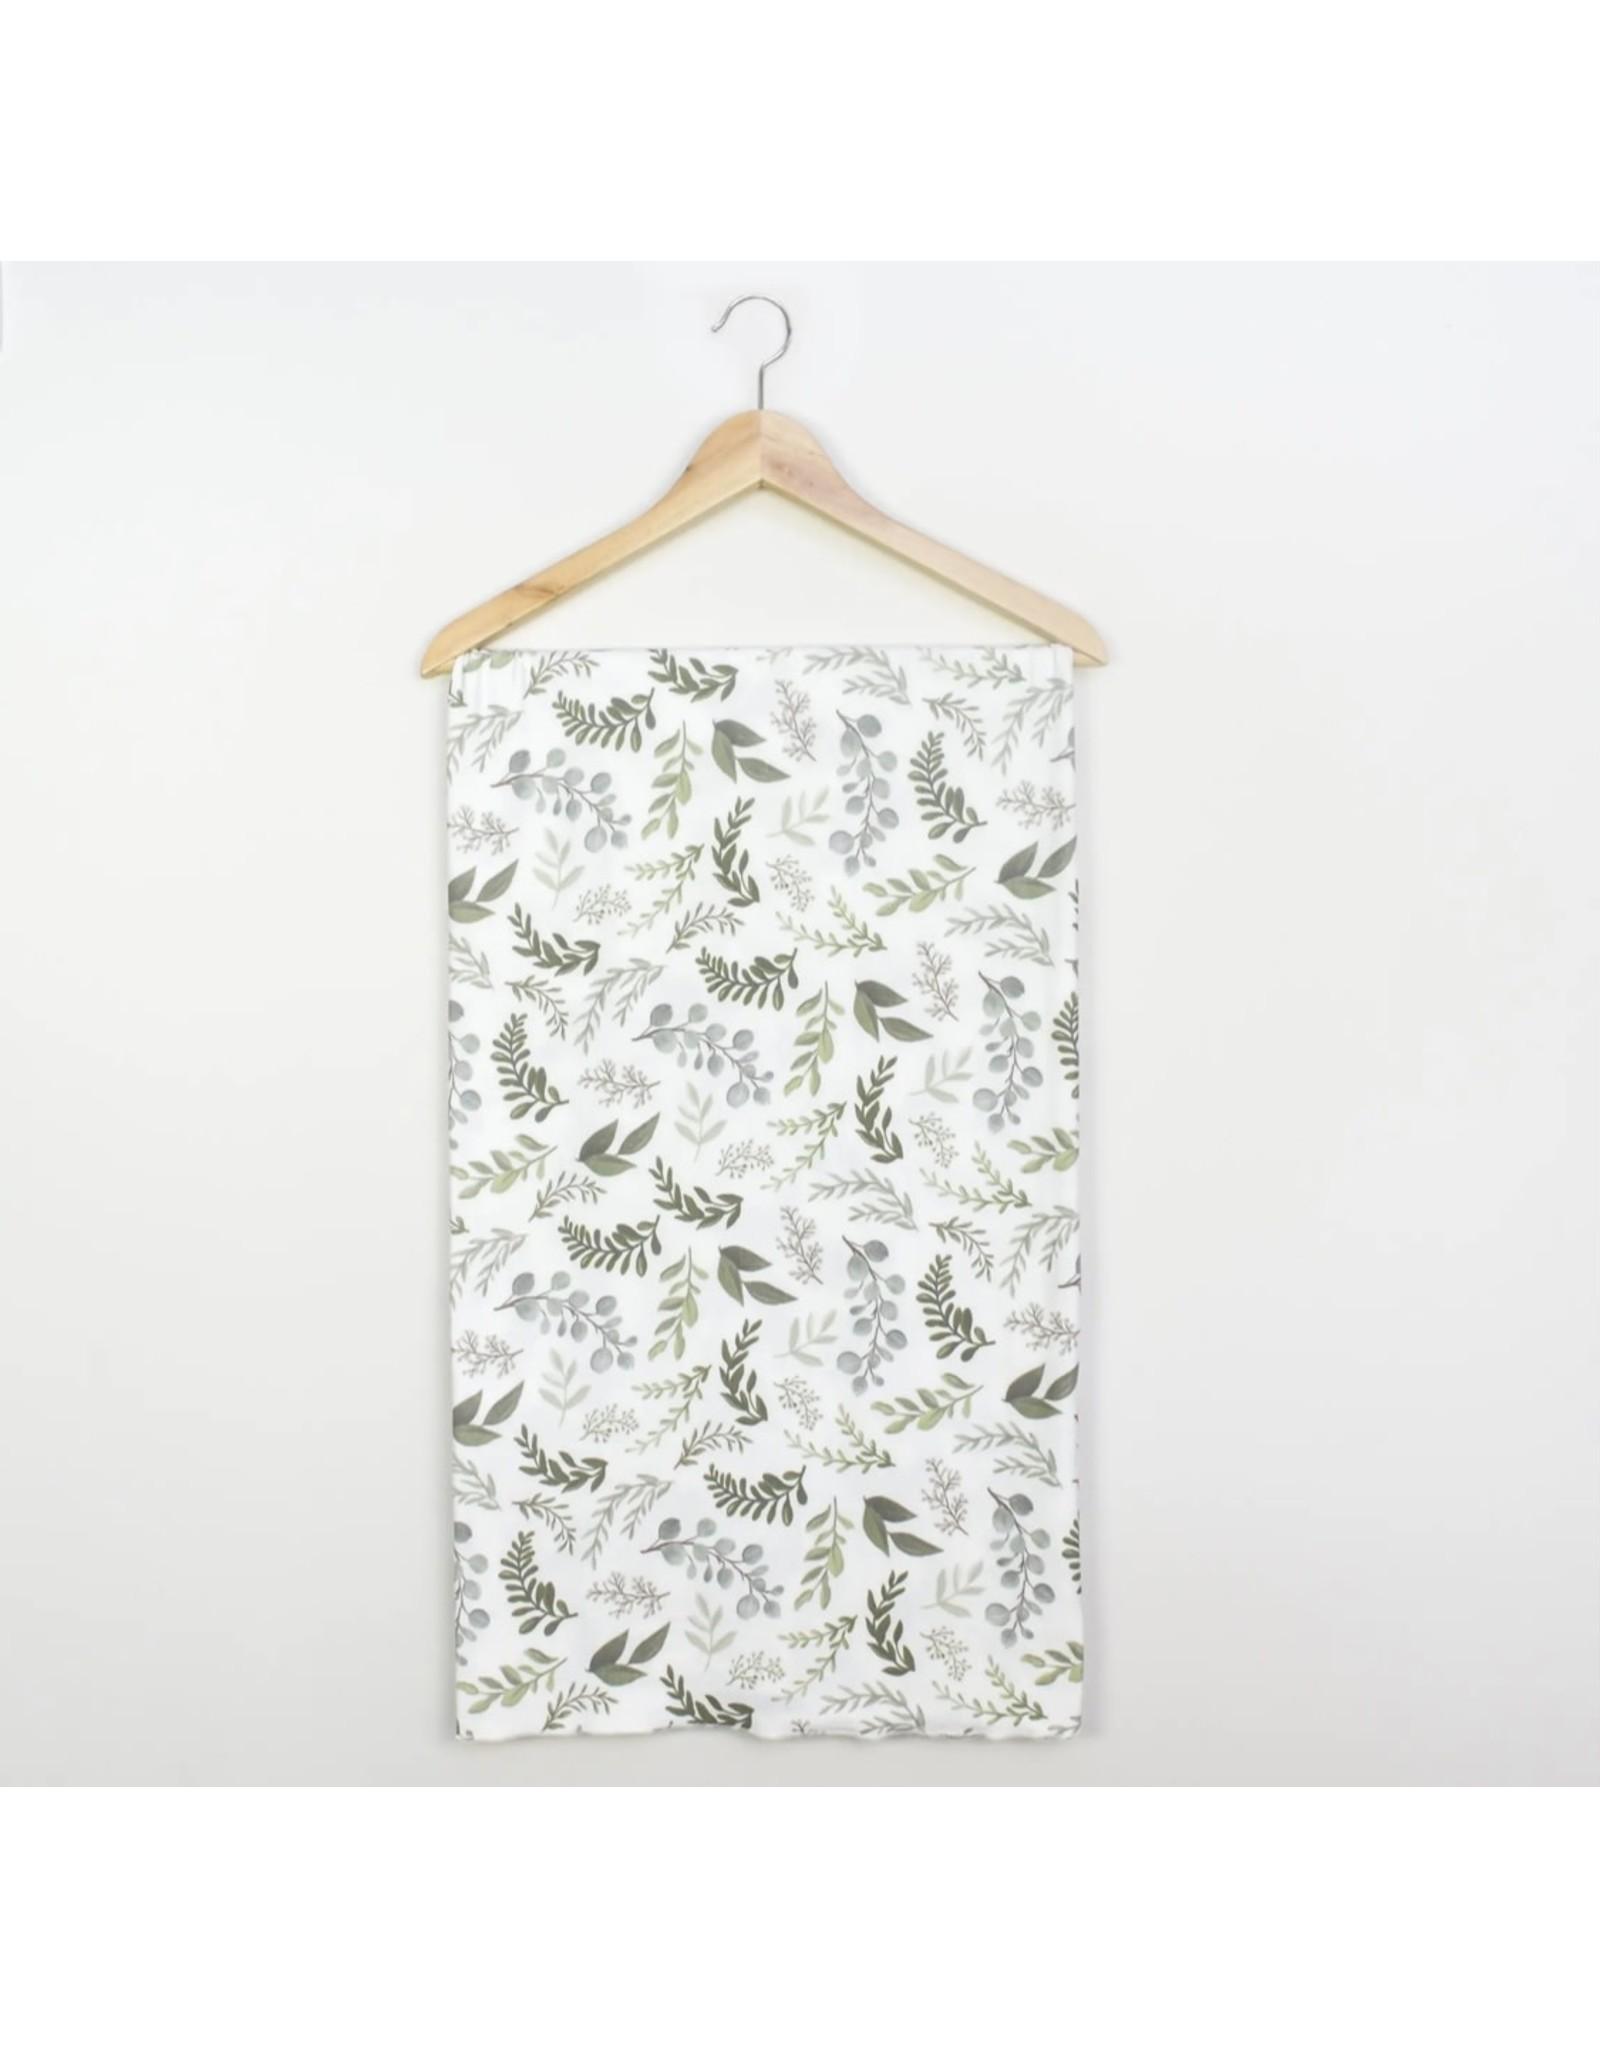 Village Baby Village Baby- Extra Soft Stretchy Knit Swaddle Blanket: Graceful Greenery